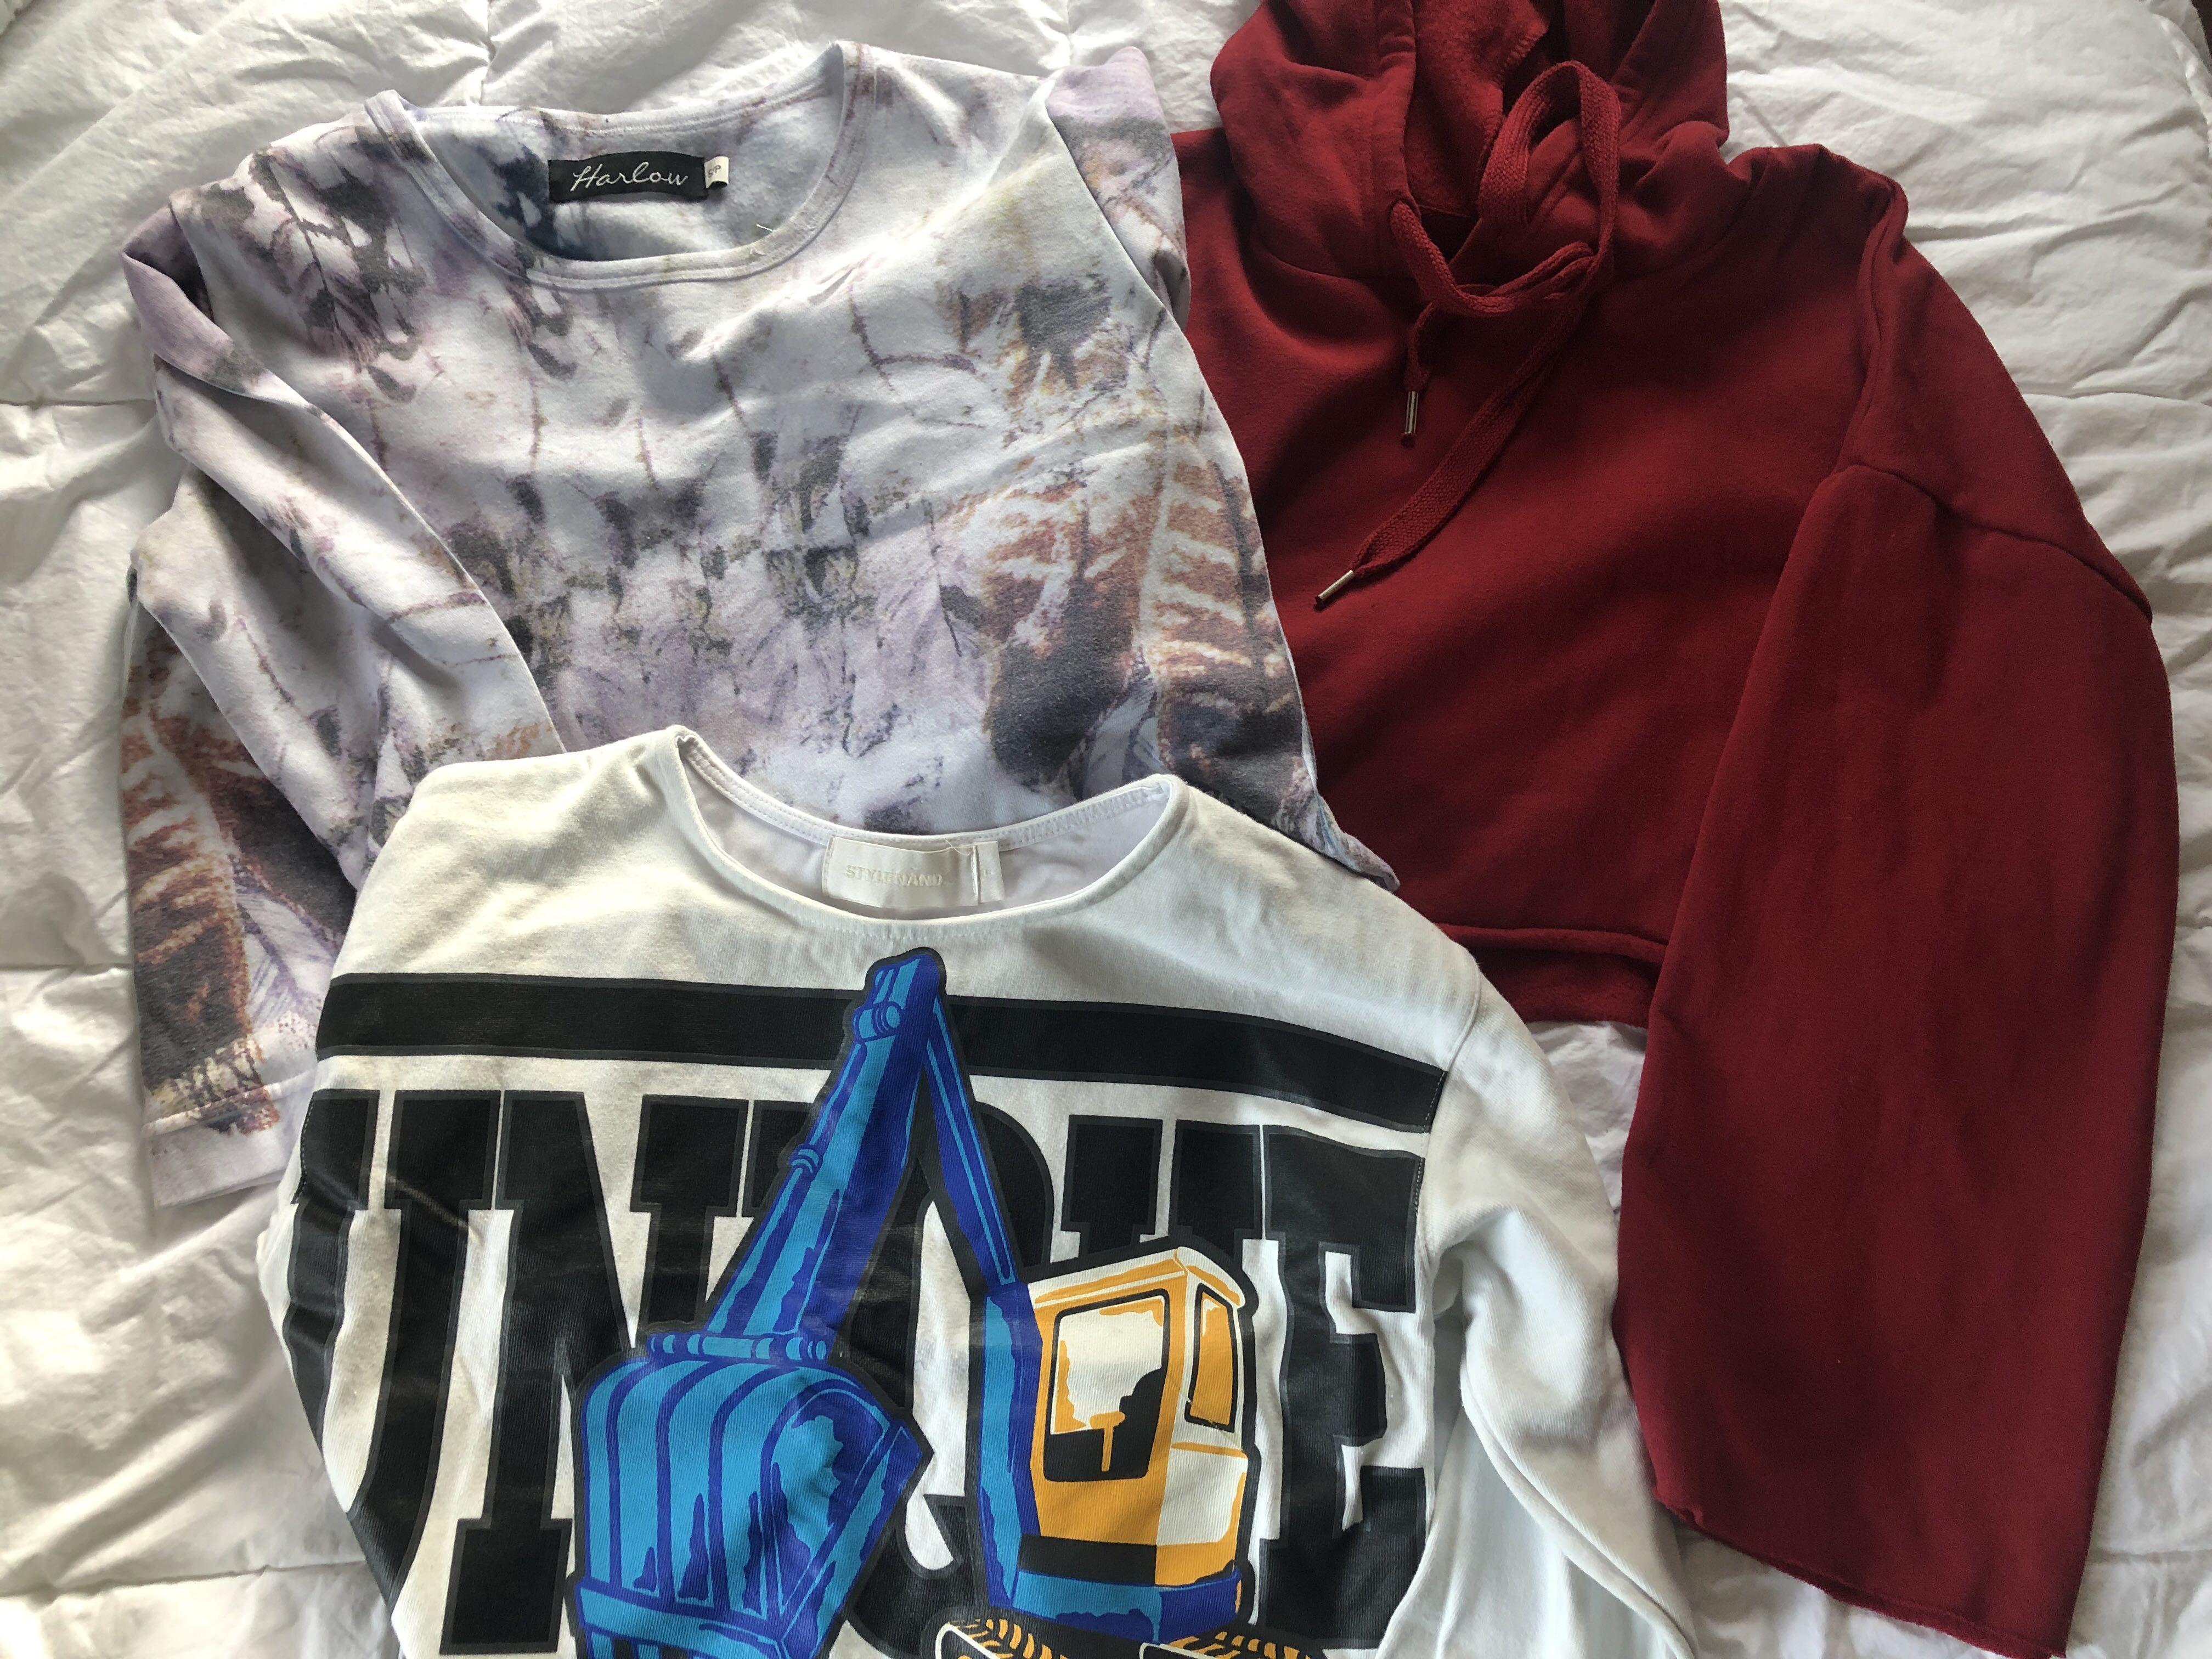 Cropped sweater bundle - Stylenanda, Harlow (Boathouse), Streetwear Society